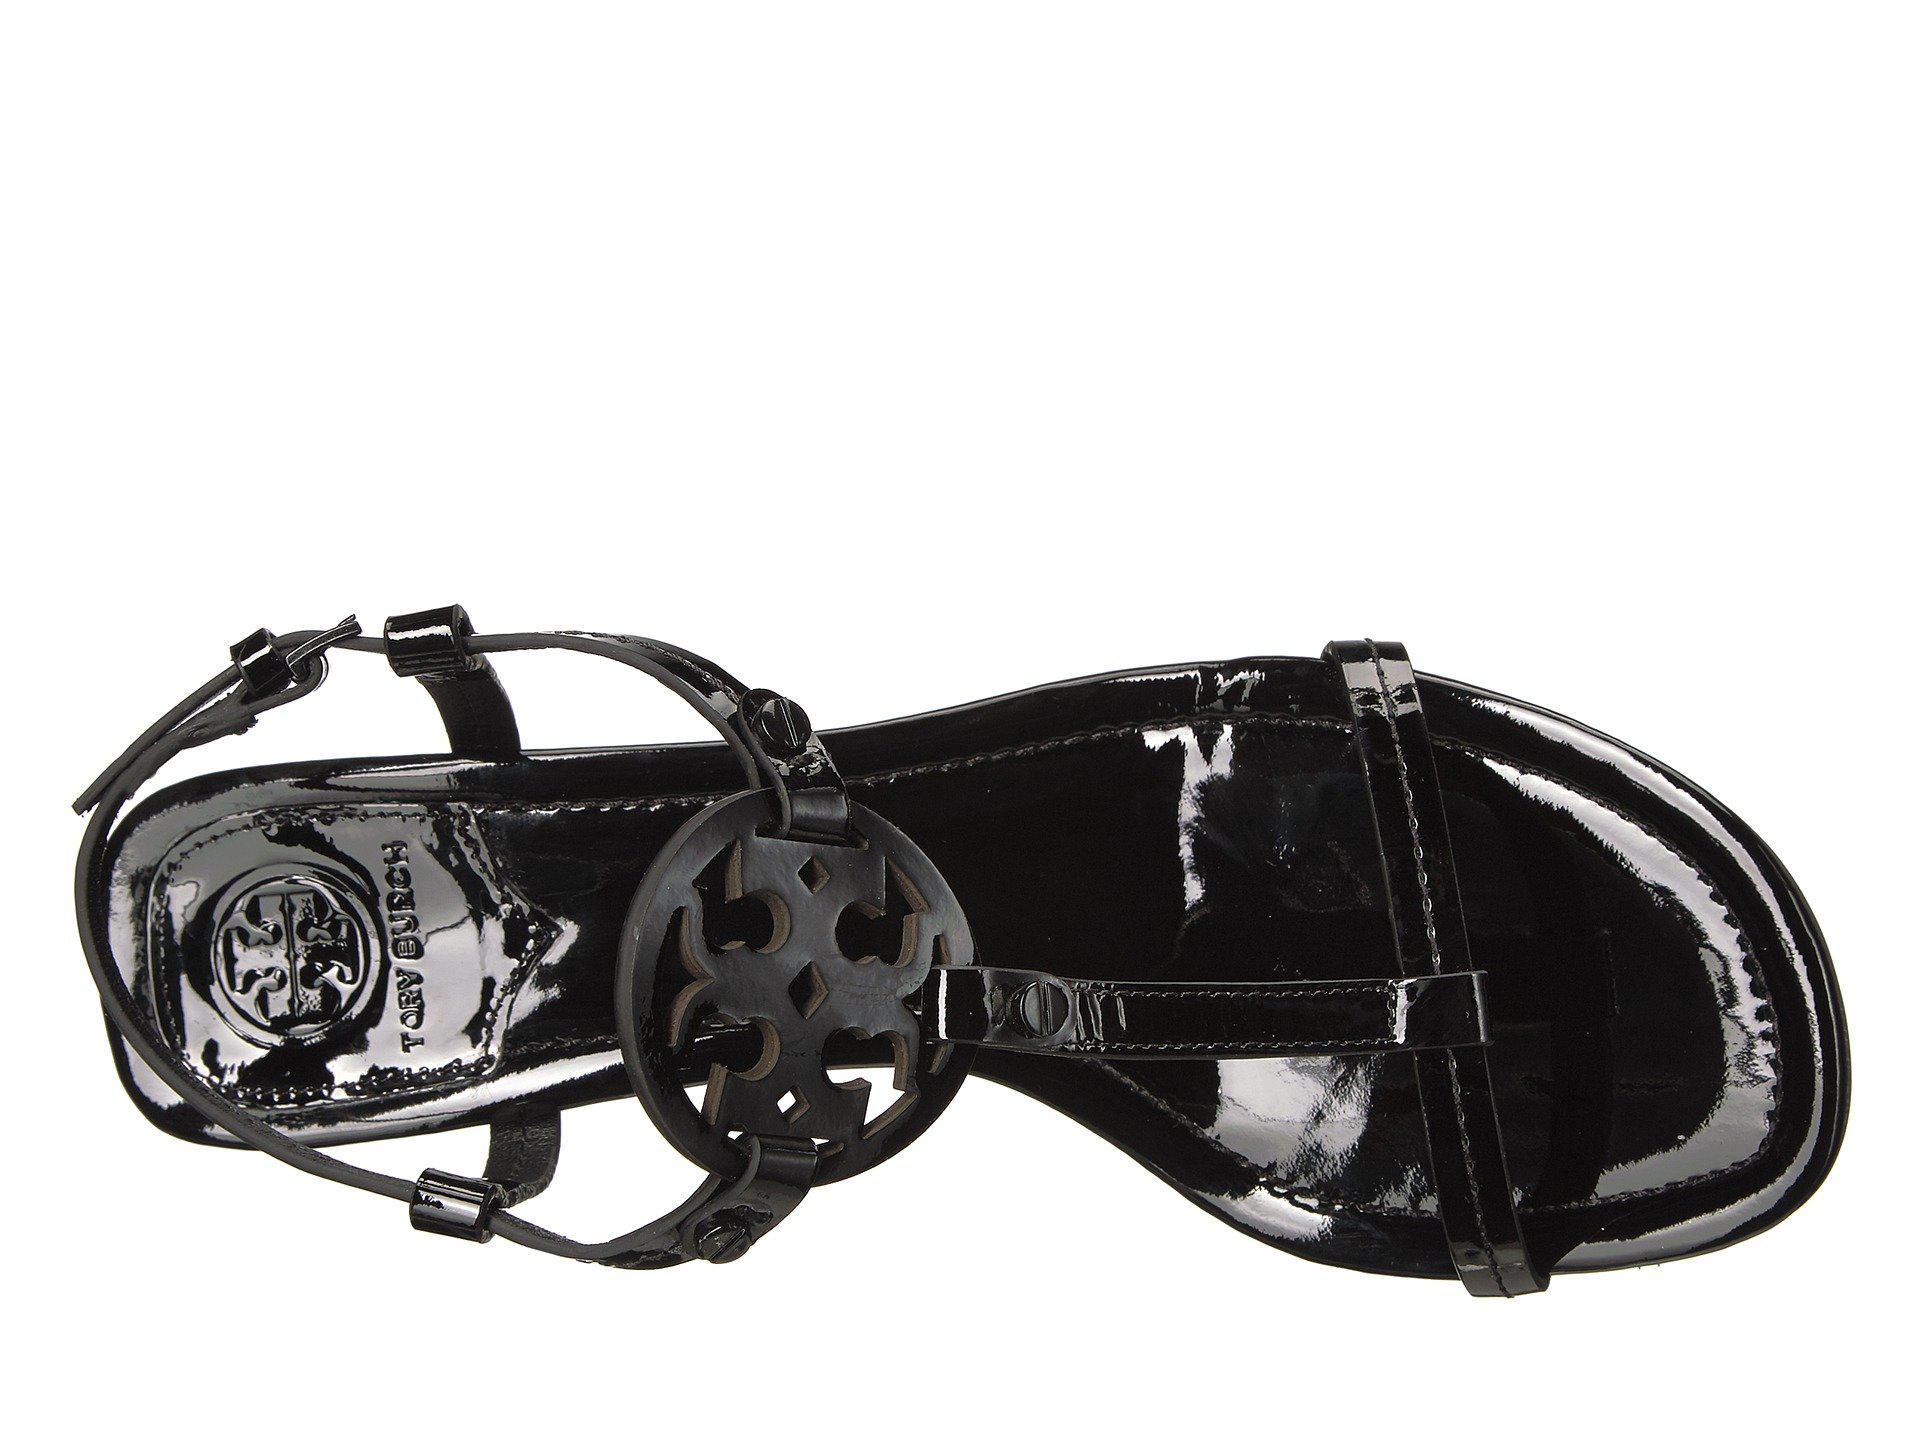 0c20d2a87c32 Lyst - Tory Burch Miller 55mm Sandal (royal Tan) Women s Sandals in ...